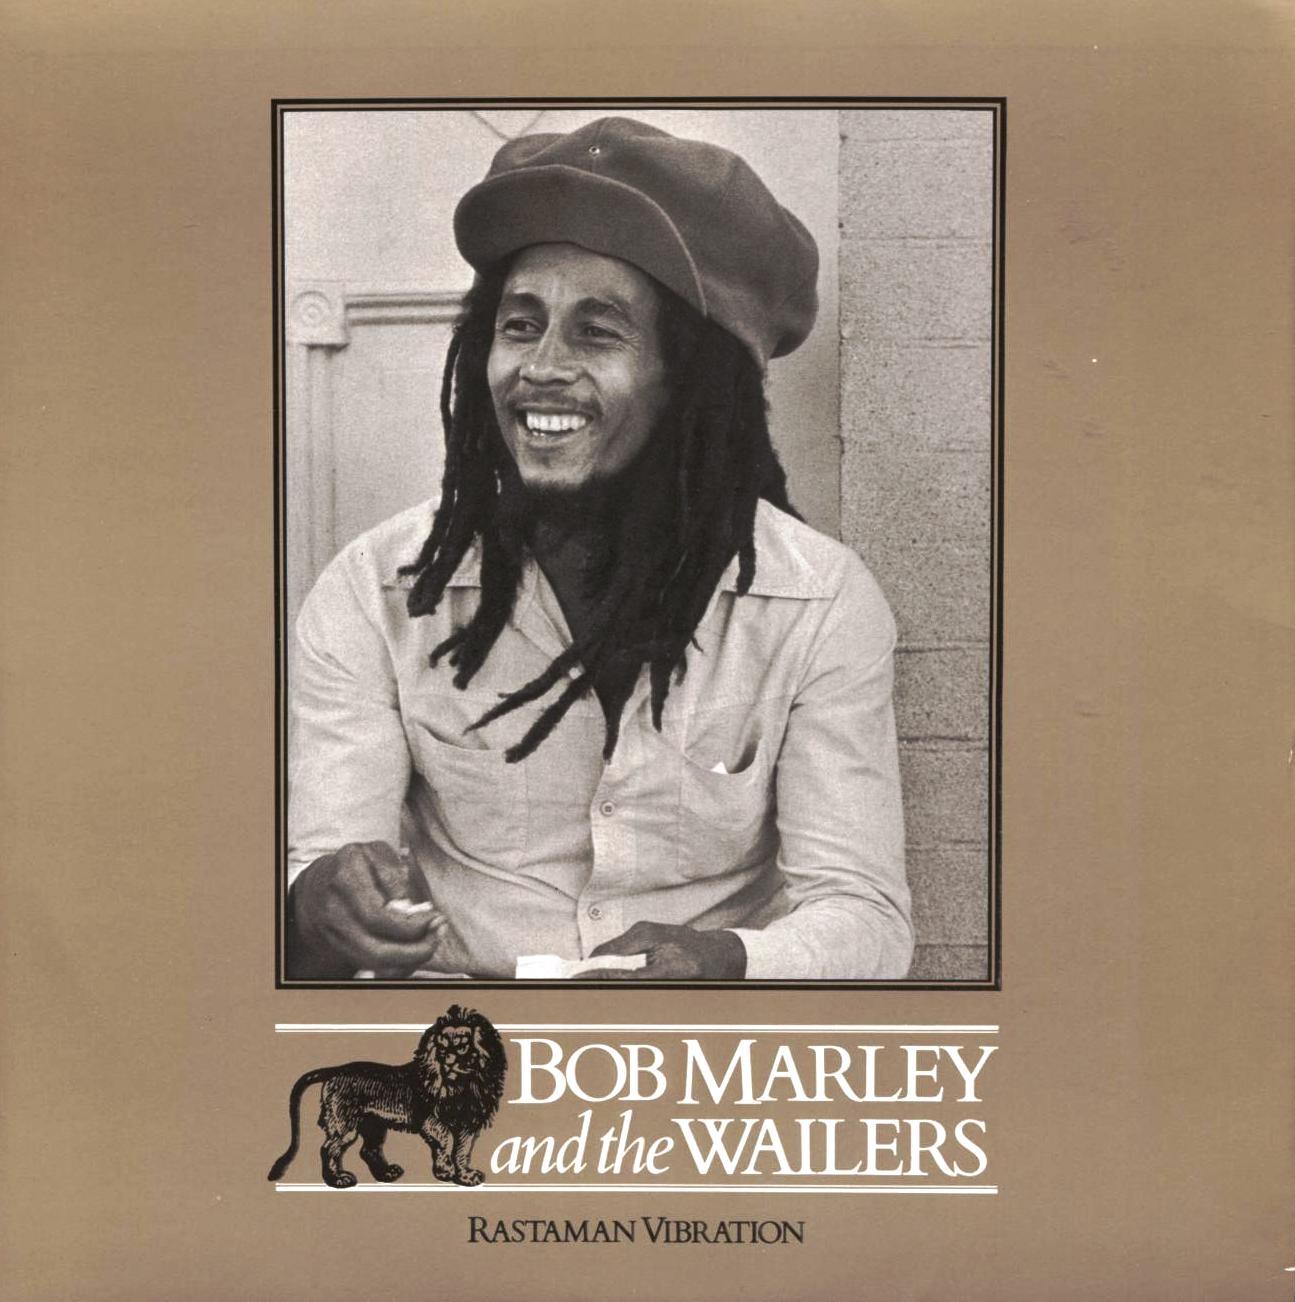 Bob Marley & the Wailers - Rastaman Vibration (1976) {German